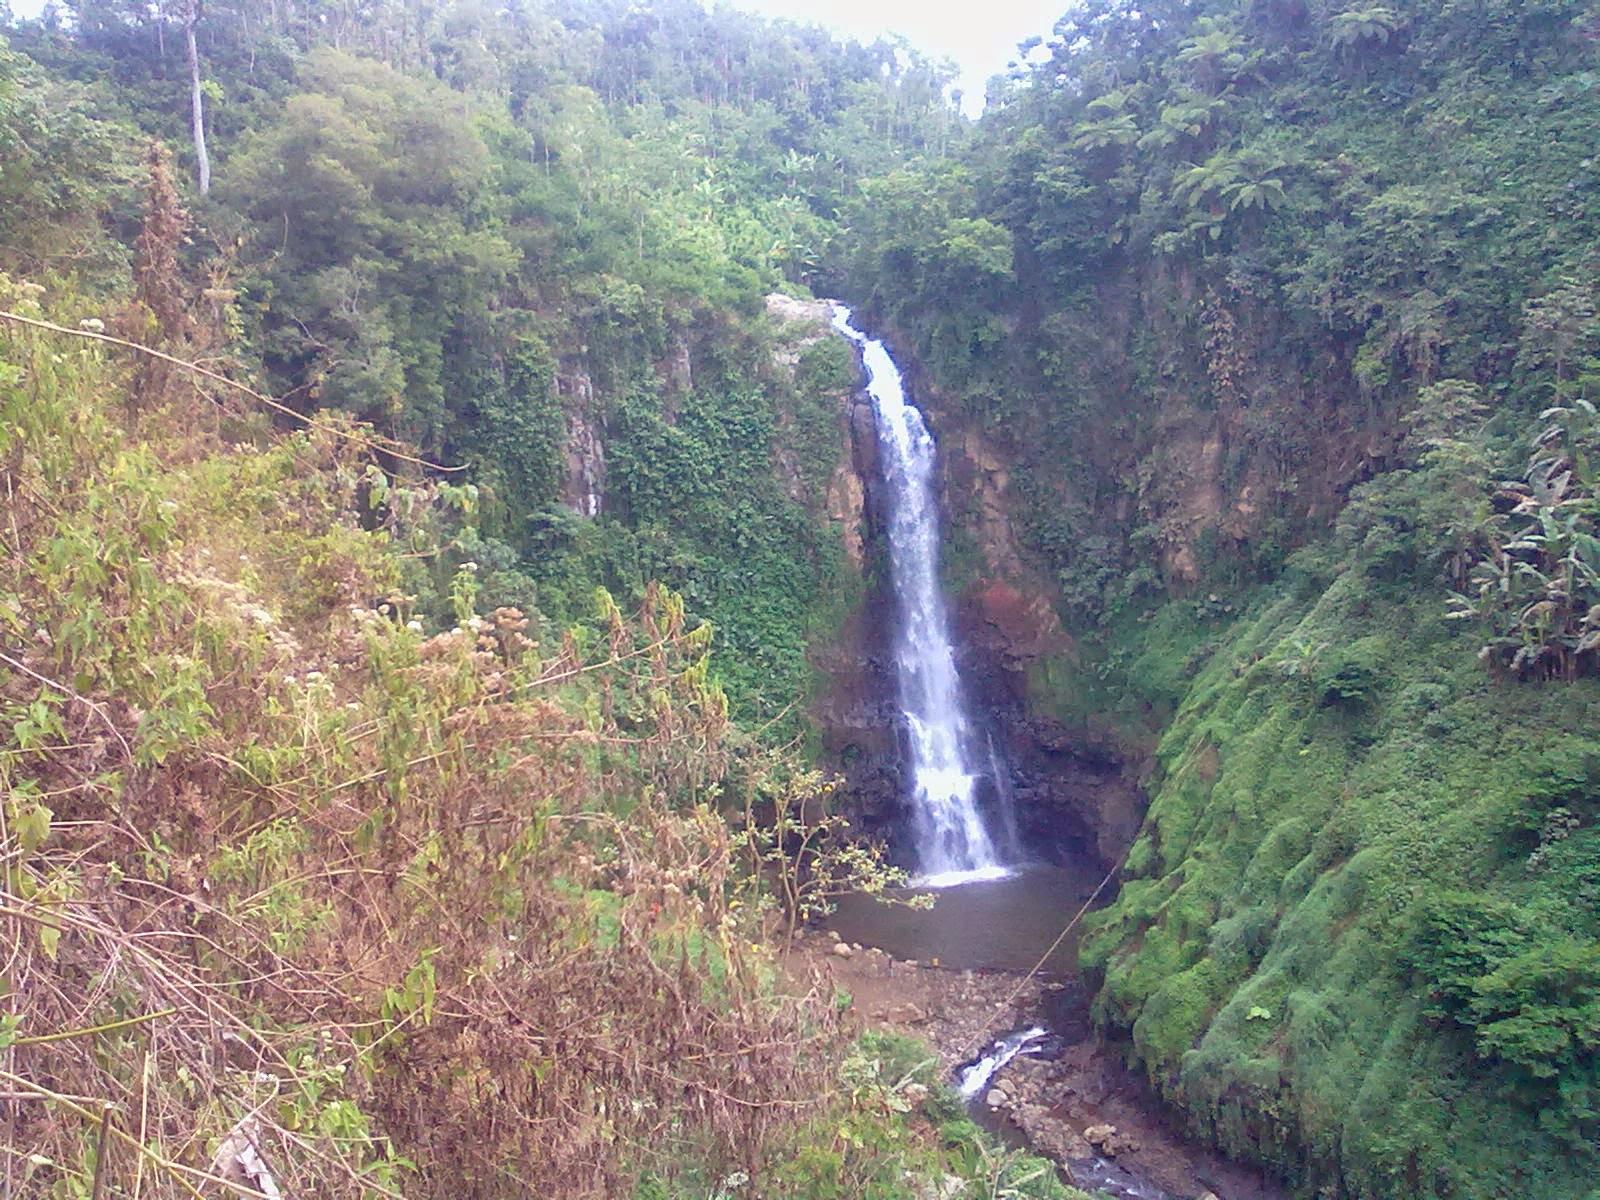 25 Tempat Wisata Terbaik Lumajang Wajib Dikunjungi Cepat Share 16